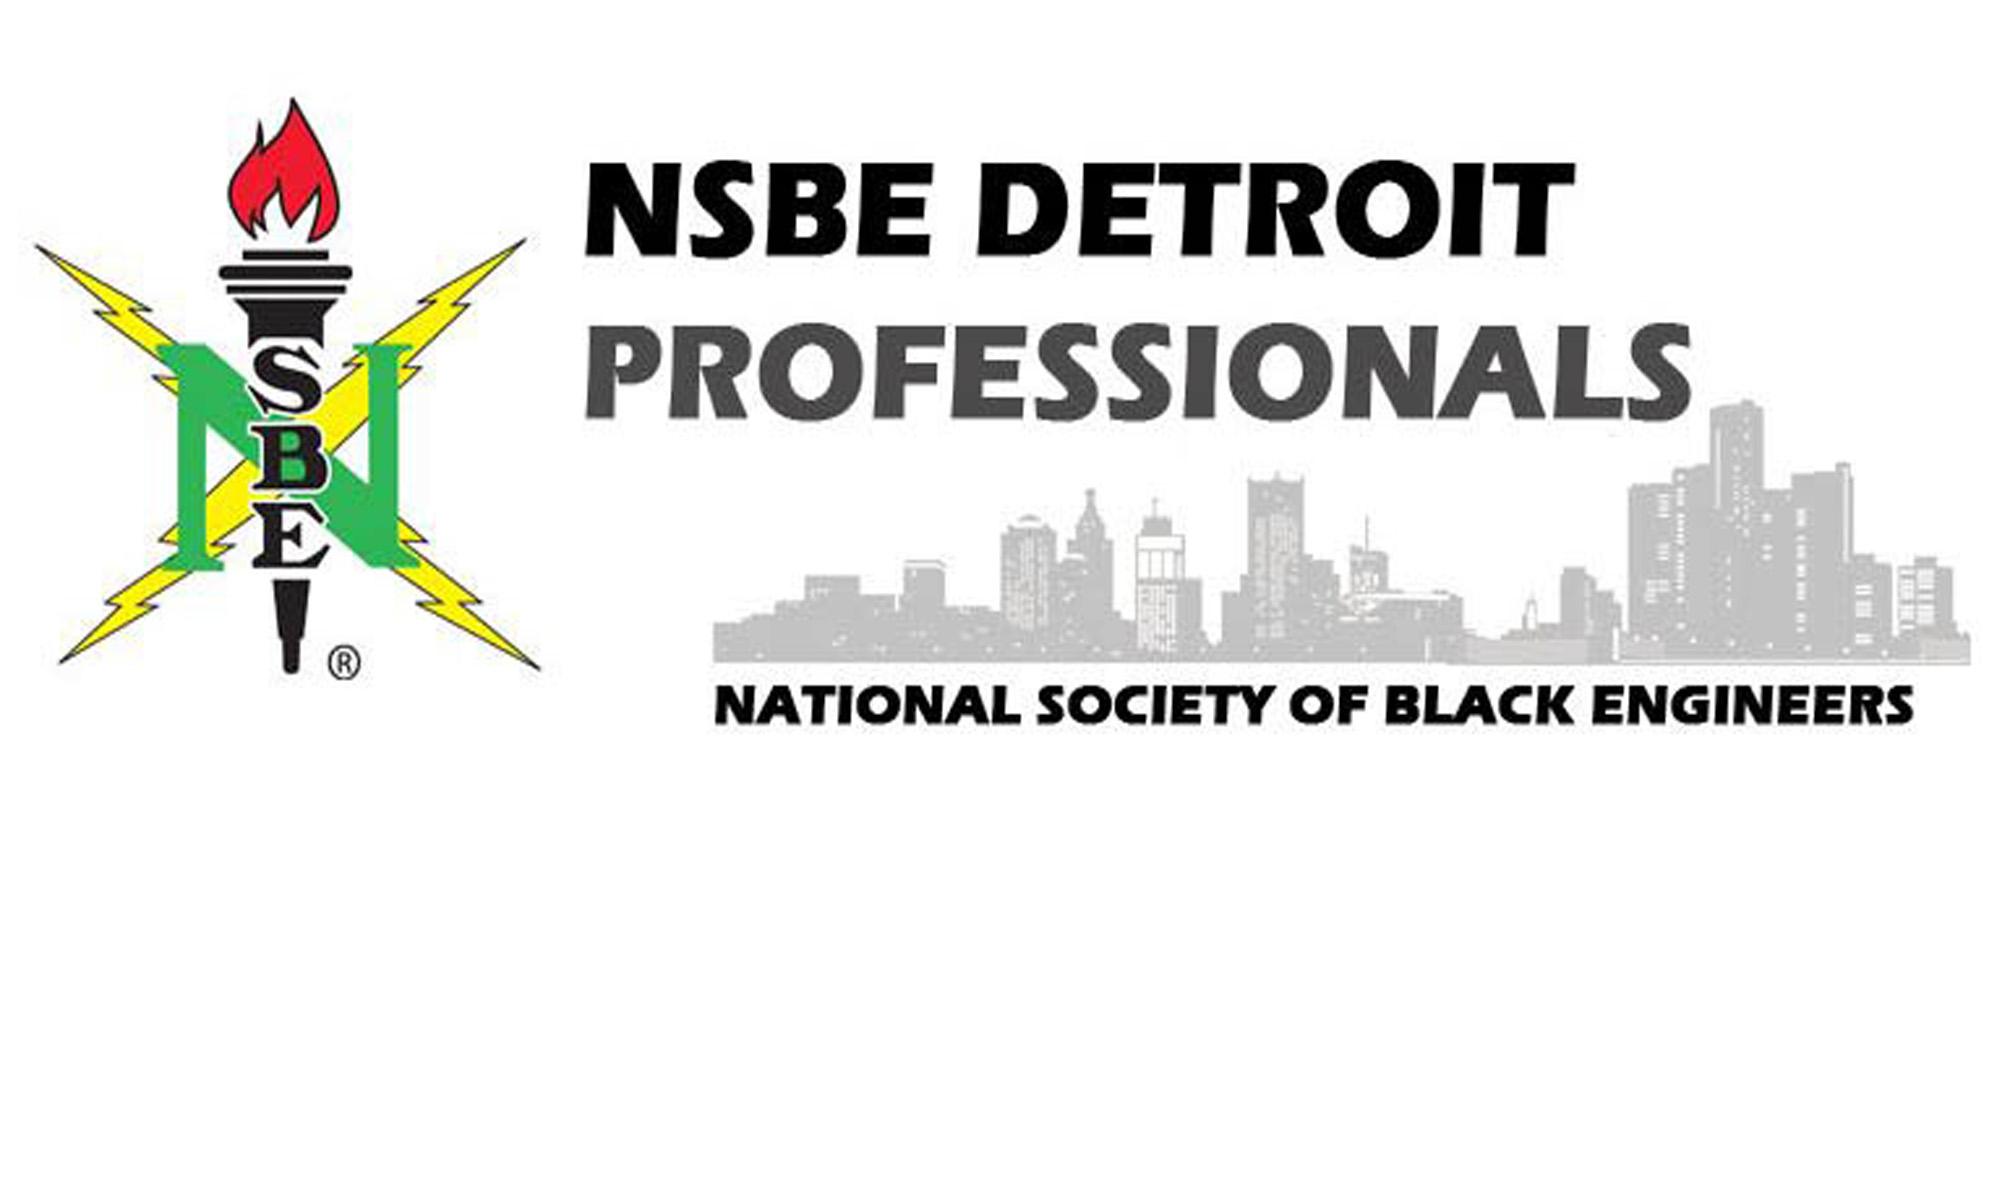 NSBE Detroit Professionals